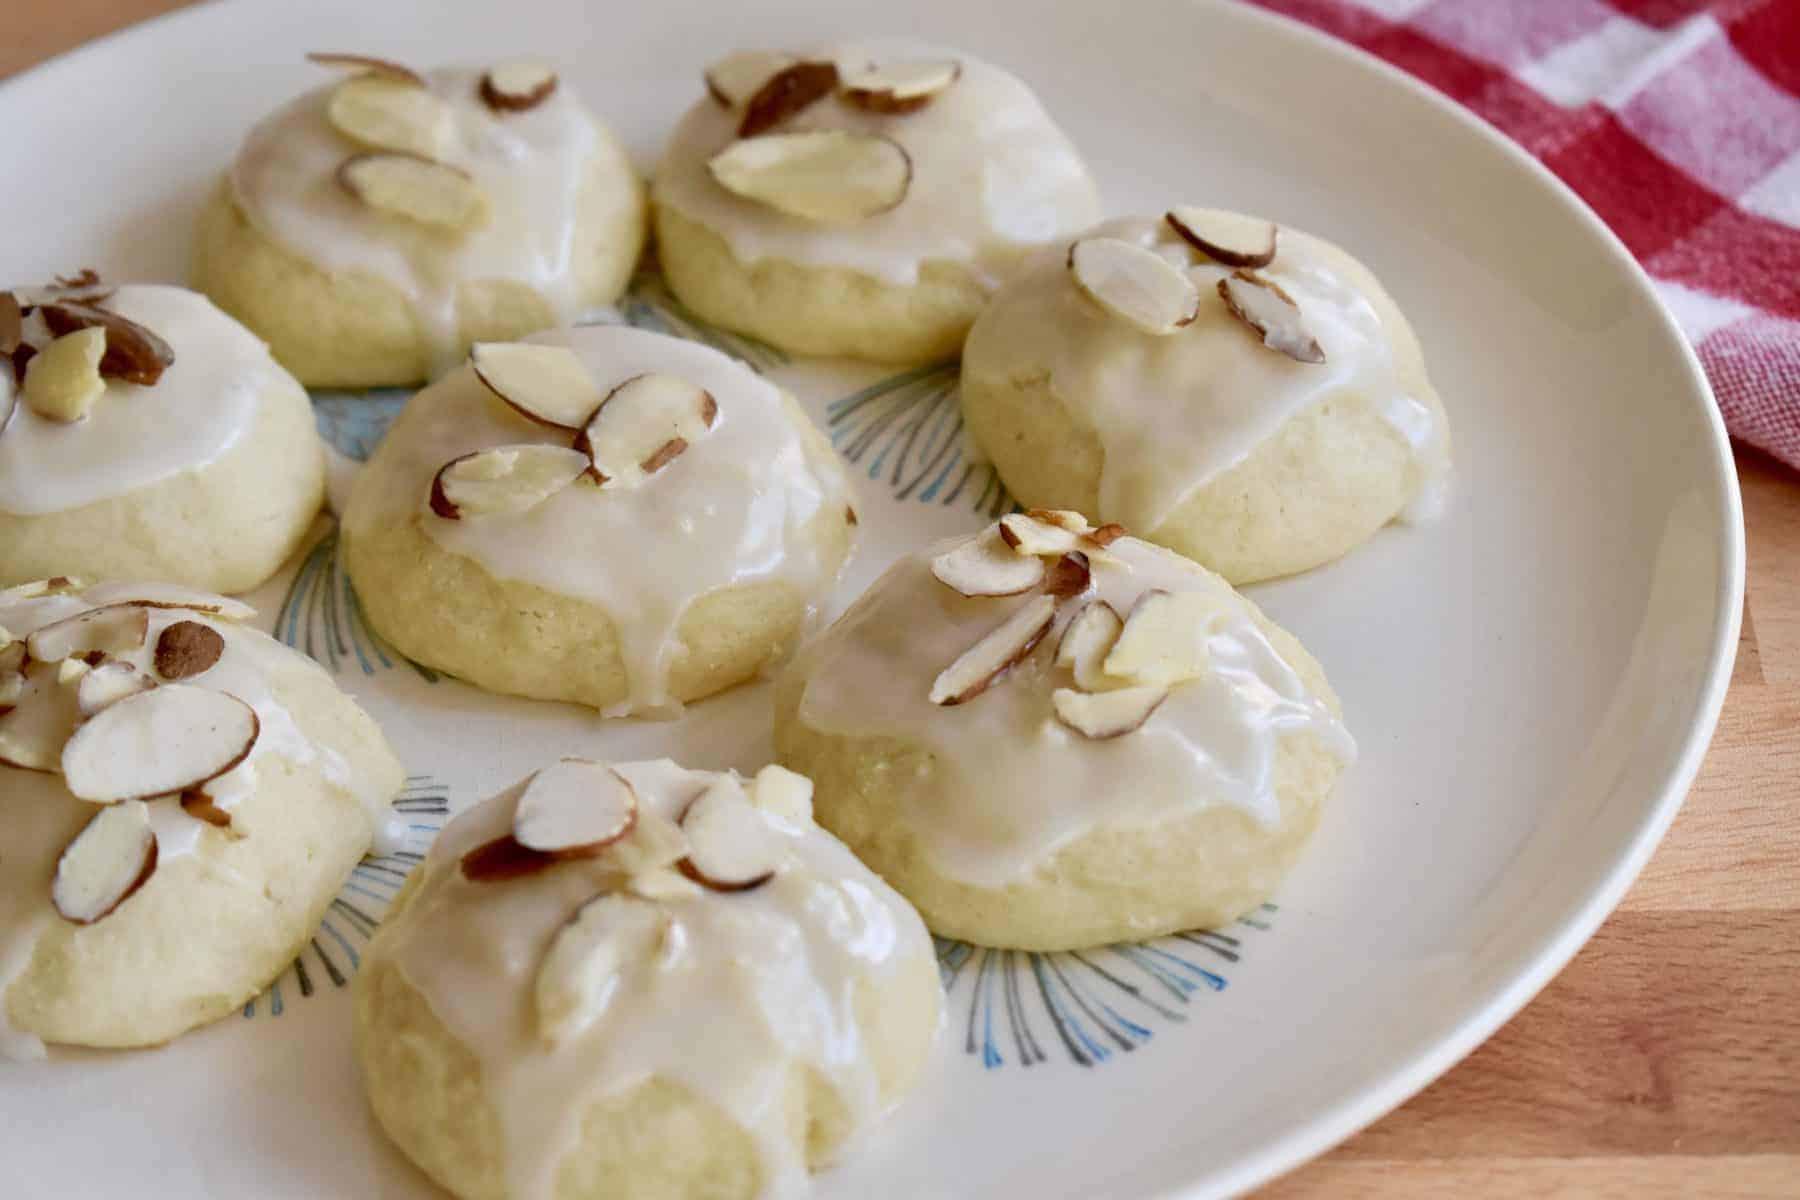 Italian Almond Ricotta Cookies on a white plate.